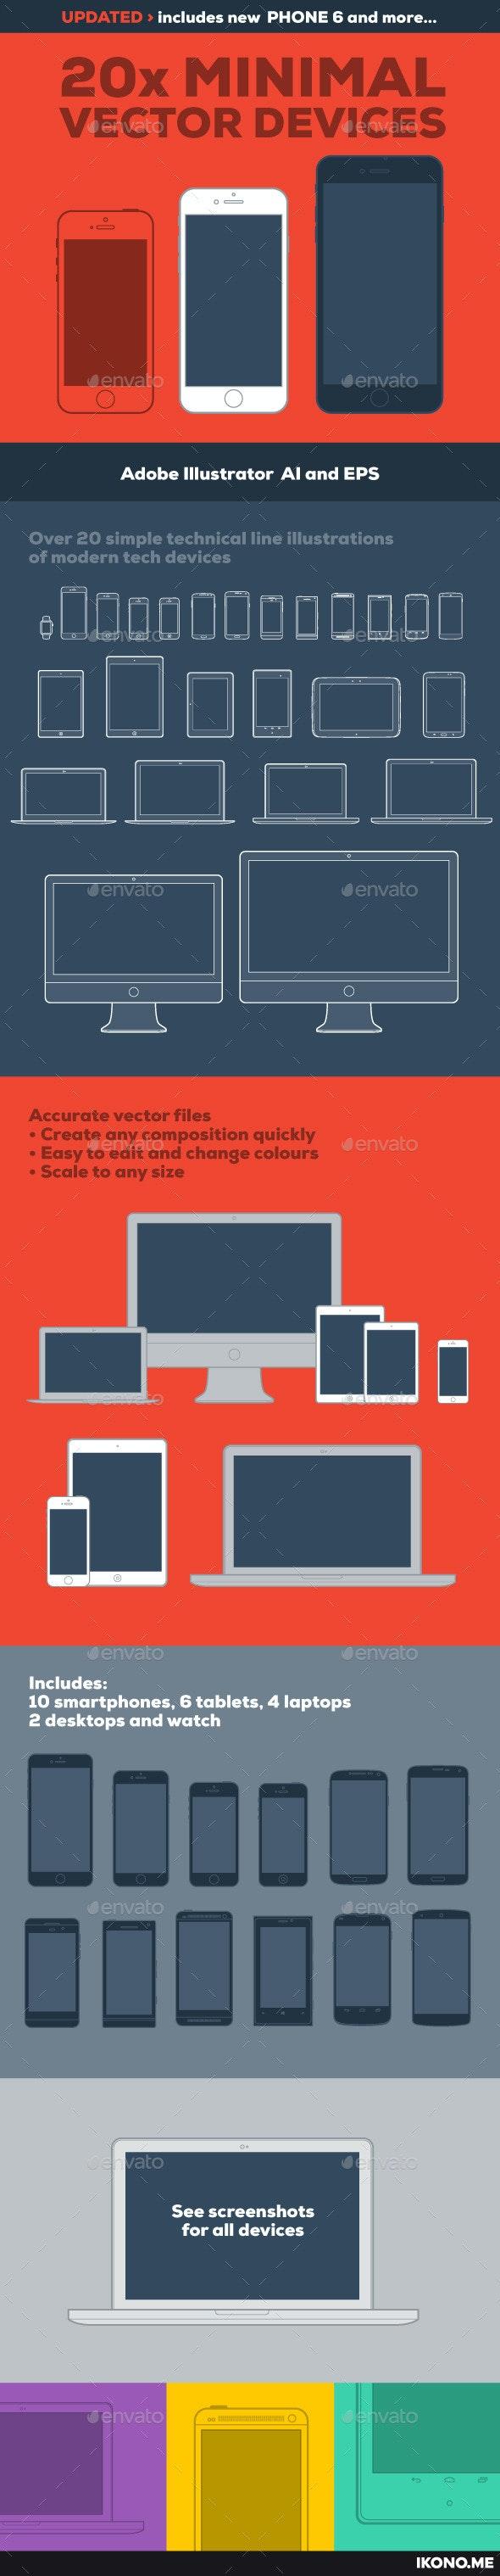 20 Minimal Vector Devices - Technology Conceptual